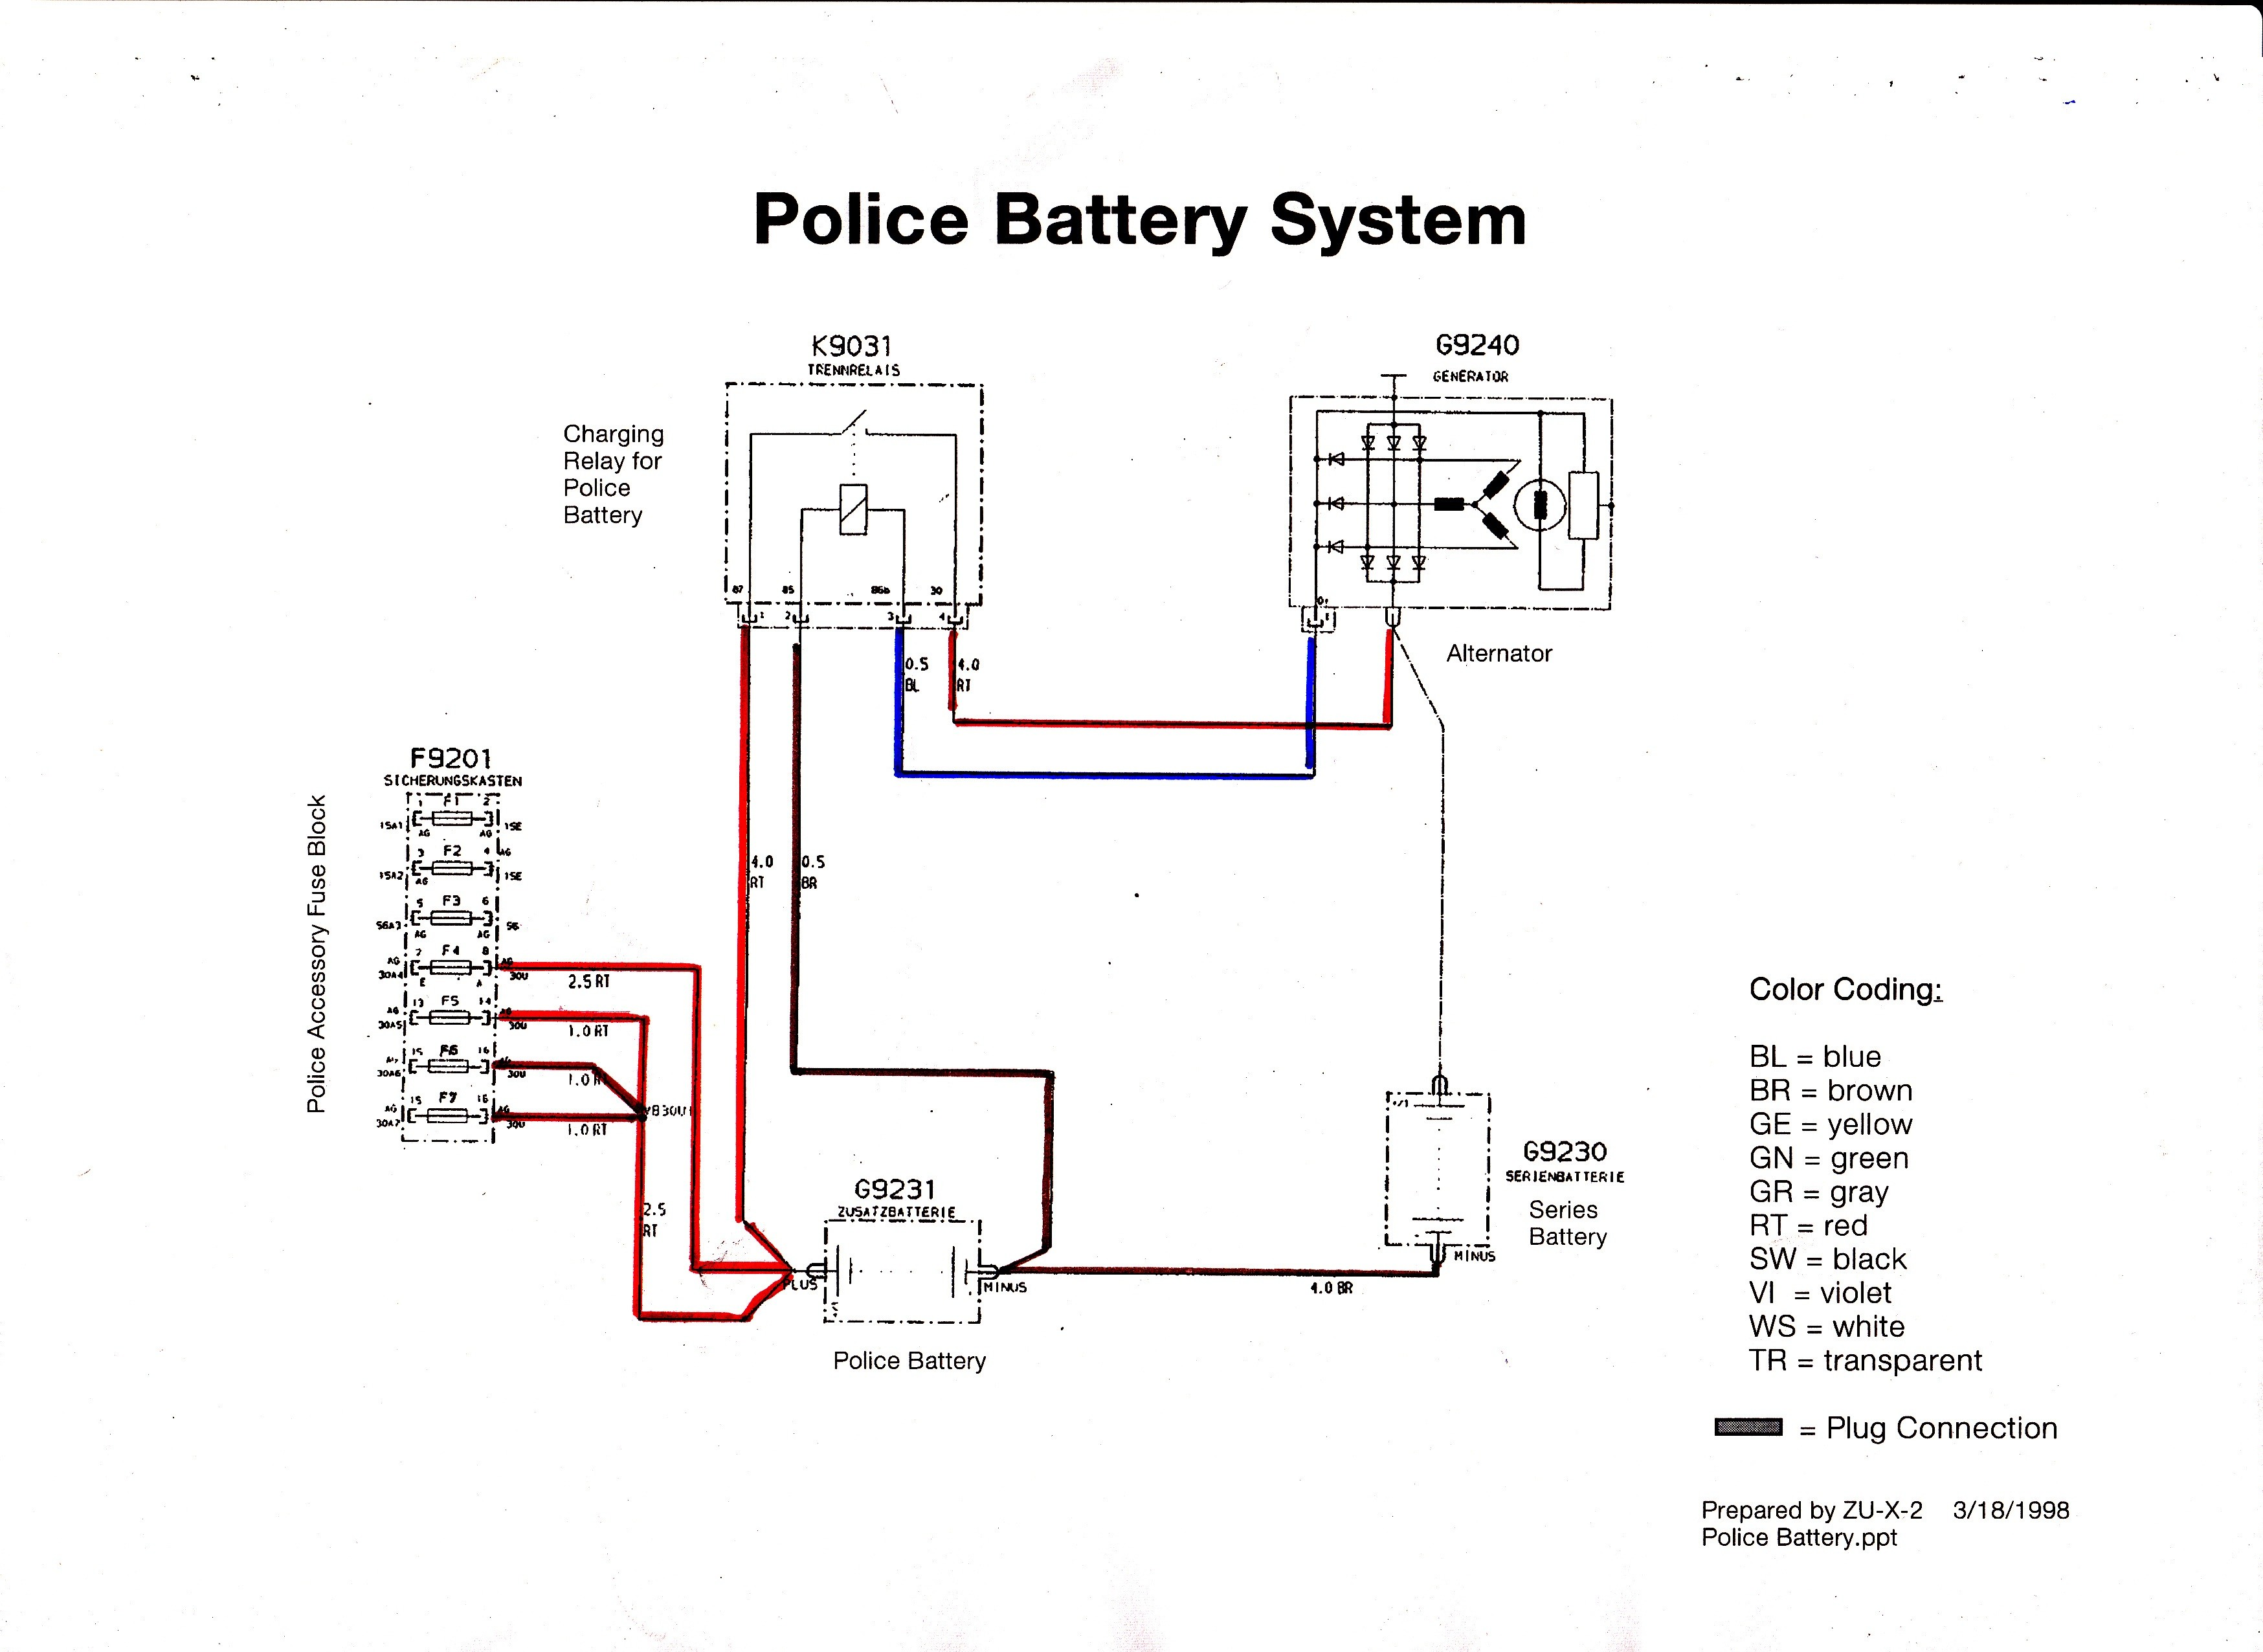 Coats 1150-2d Wiring Diagm Diagram] Mercury 1150 Wiring Diagram Full Version Hd Quality Of Coats 1150-2d Wiring Diagm